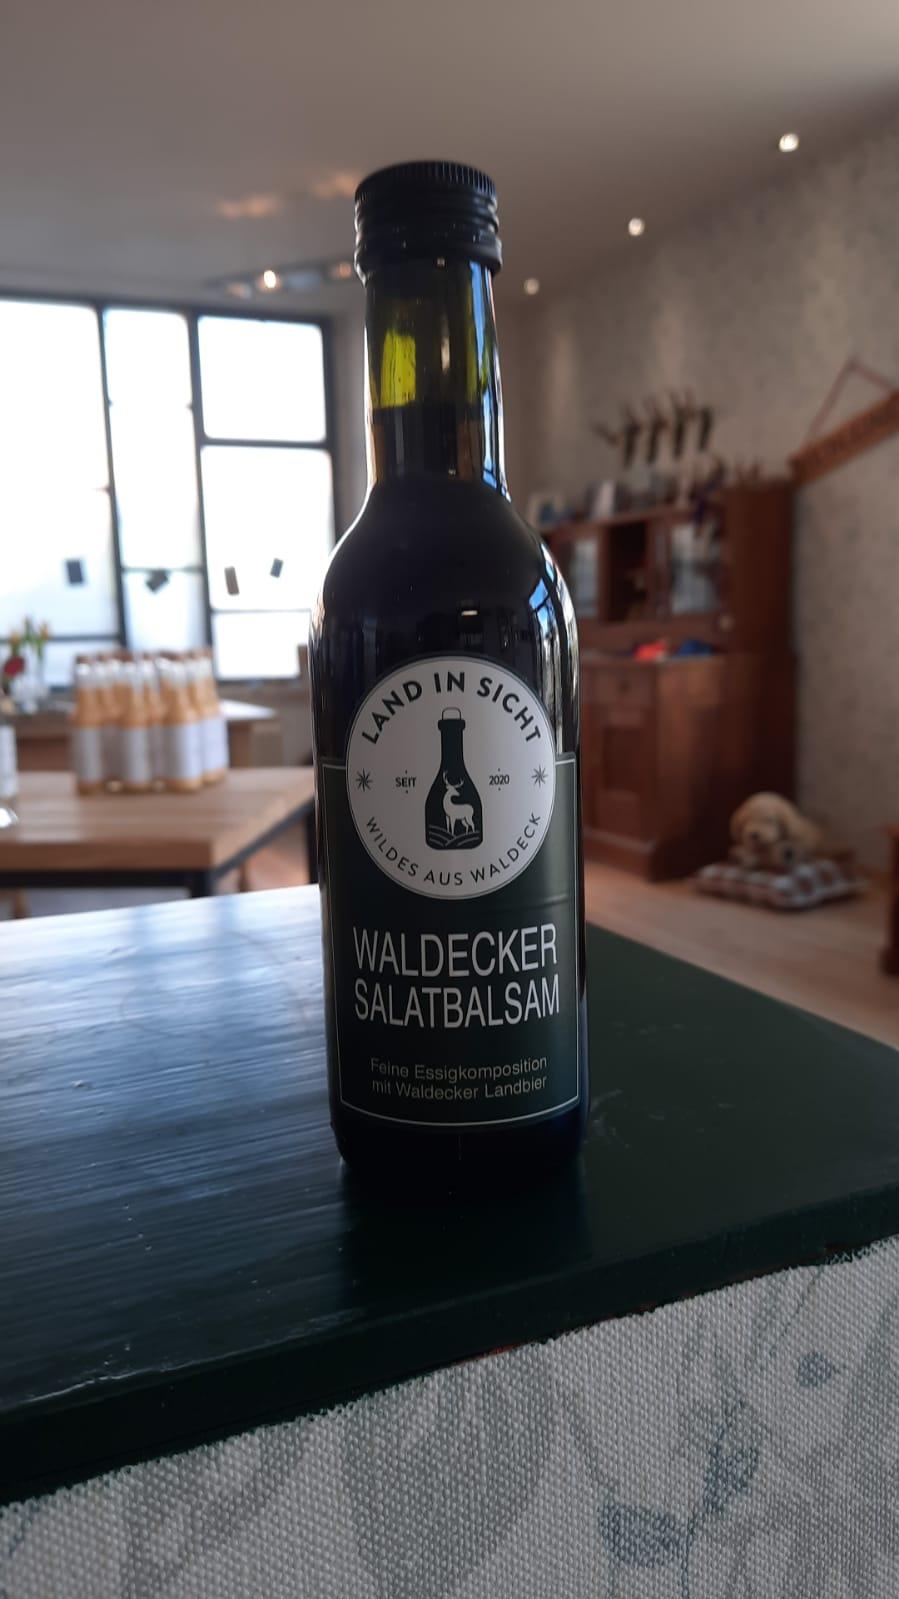 Waldecker Salatbalsam, Salatdressing, Essig